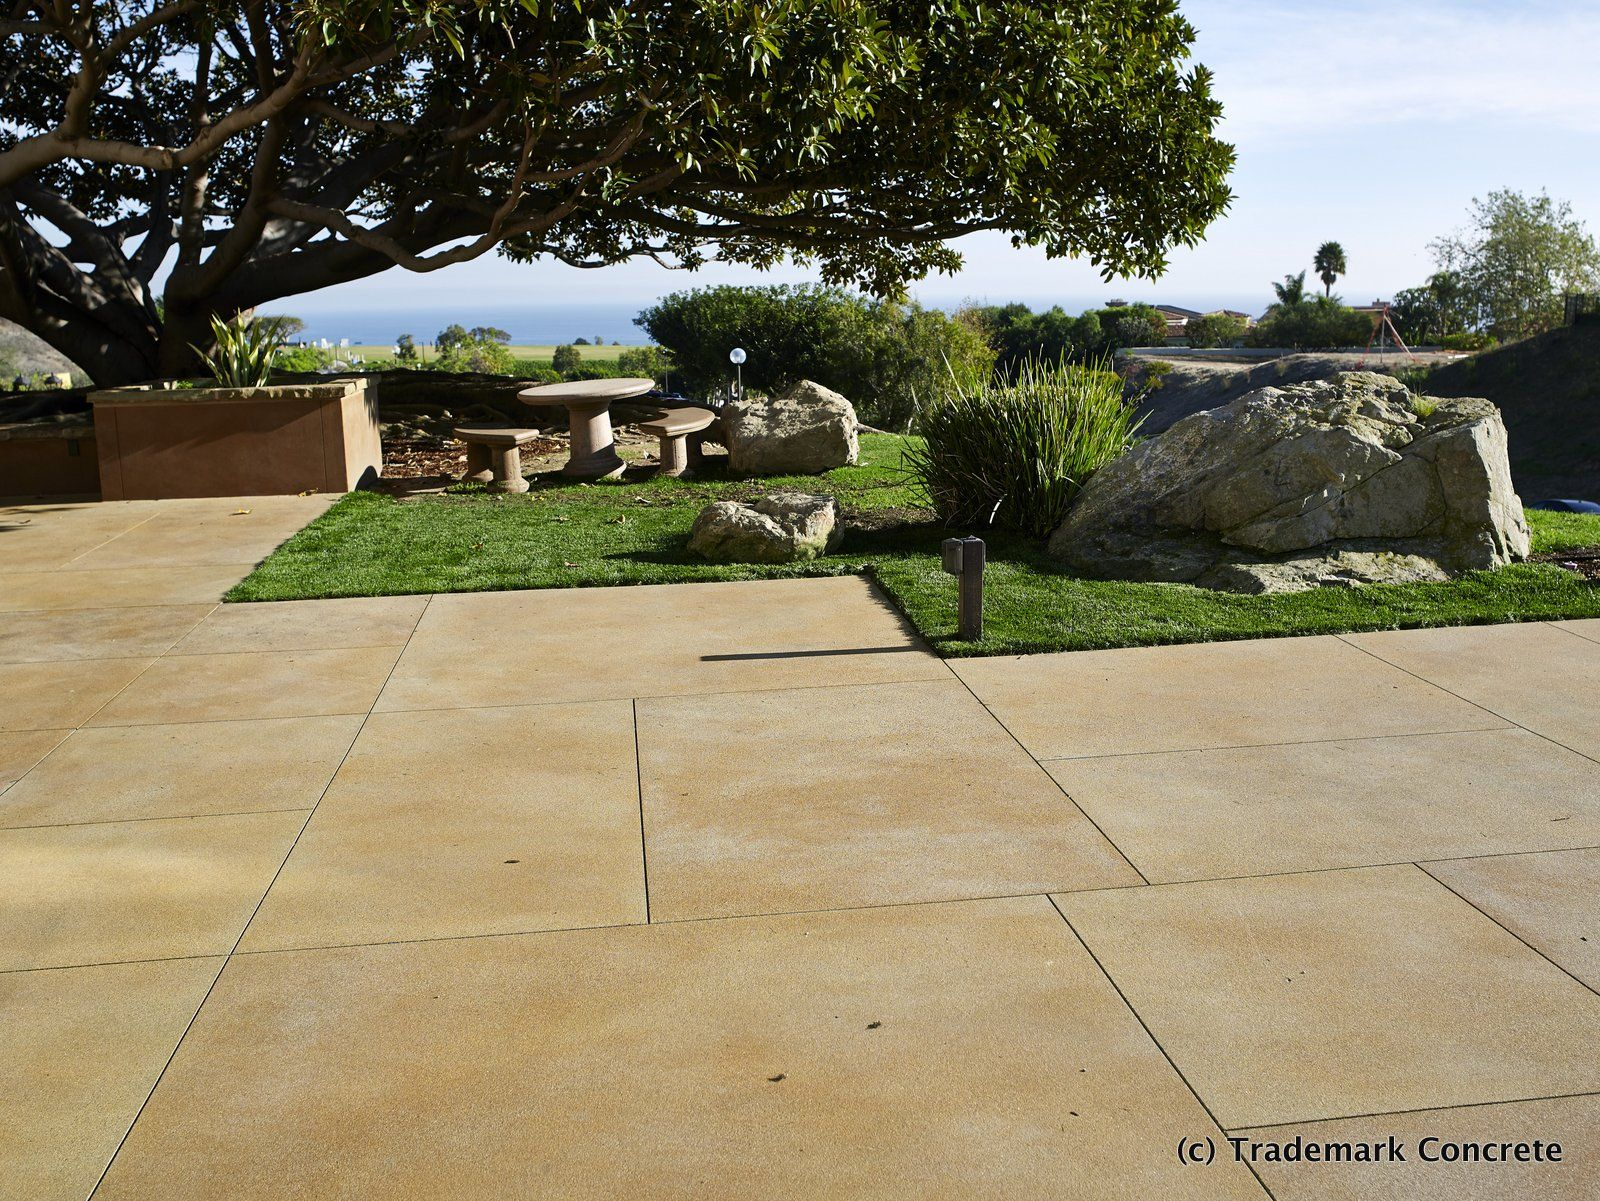 Decorative concrete installed by DCC member Trademark Concrete ...